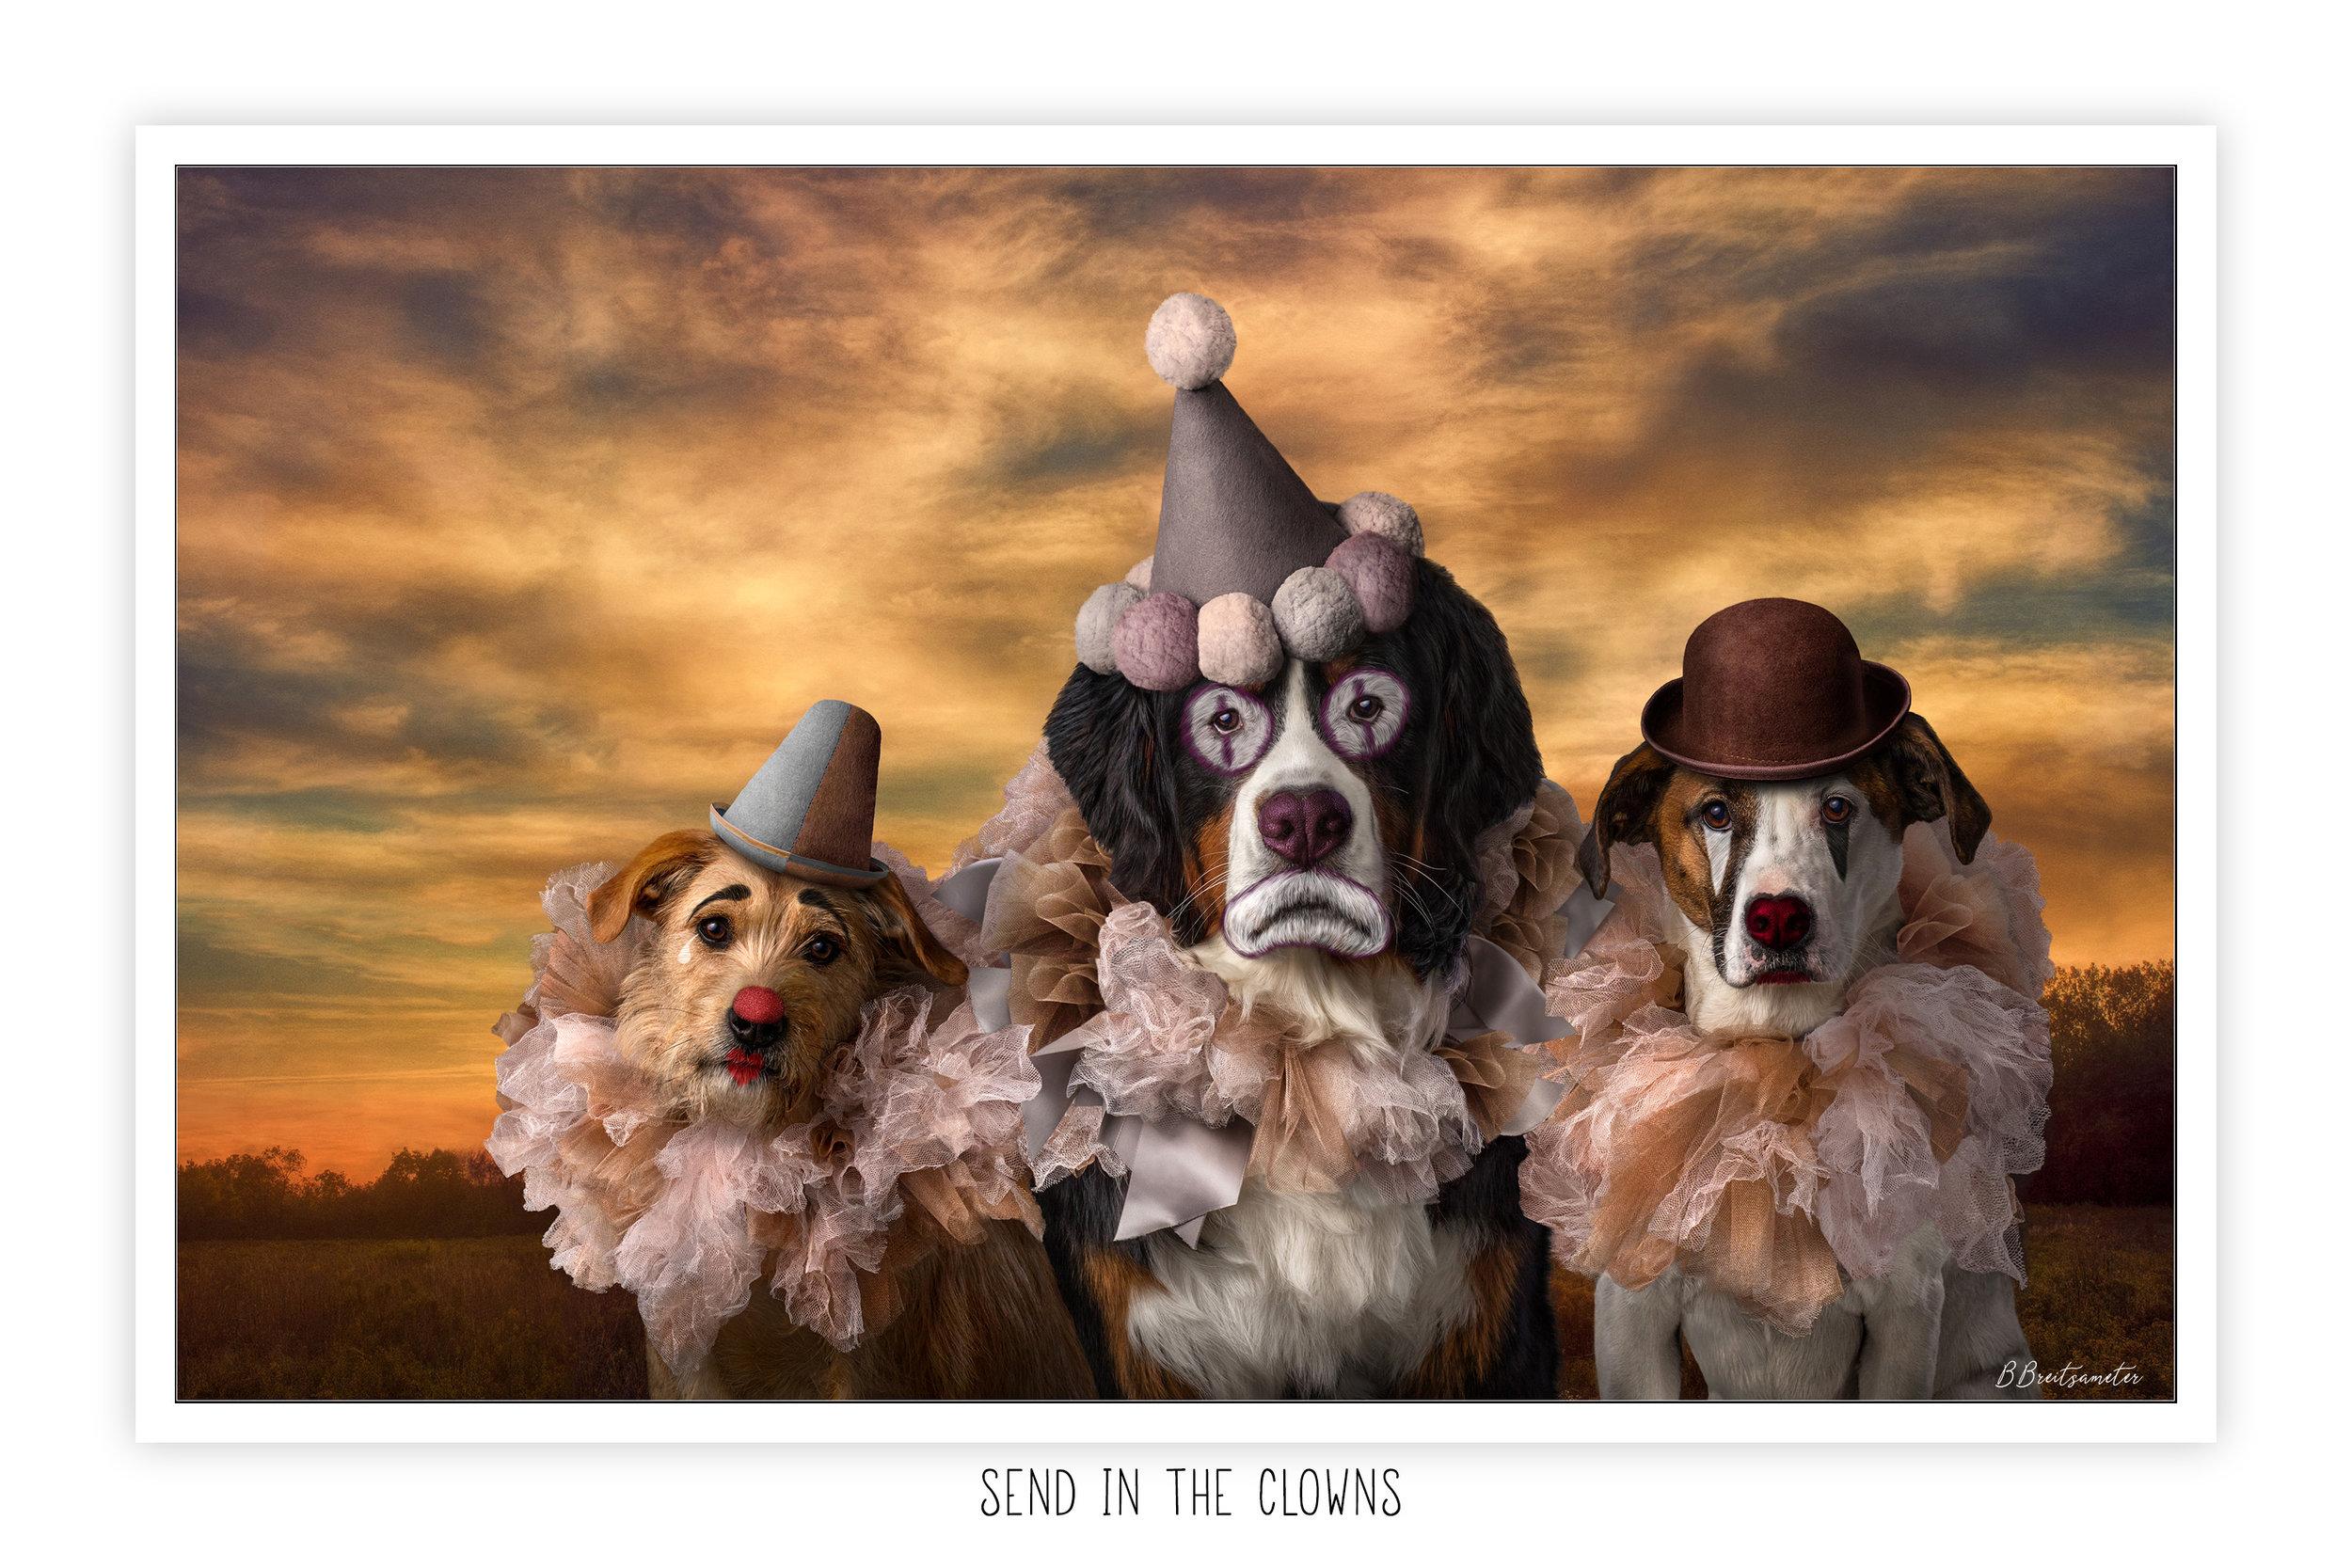 website_Send-in-the-clowns_barbara-breitsameter.jpg